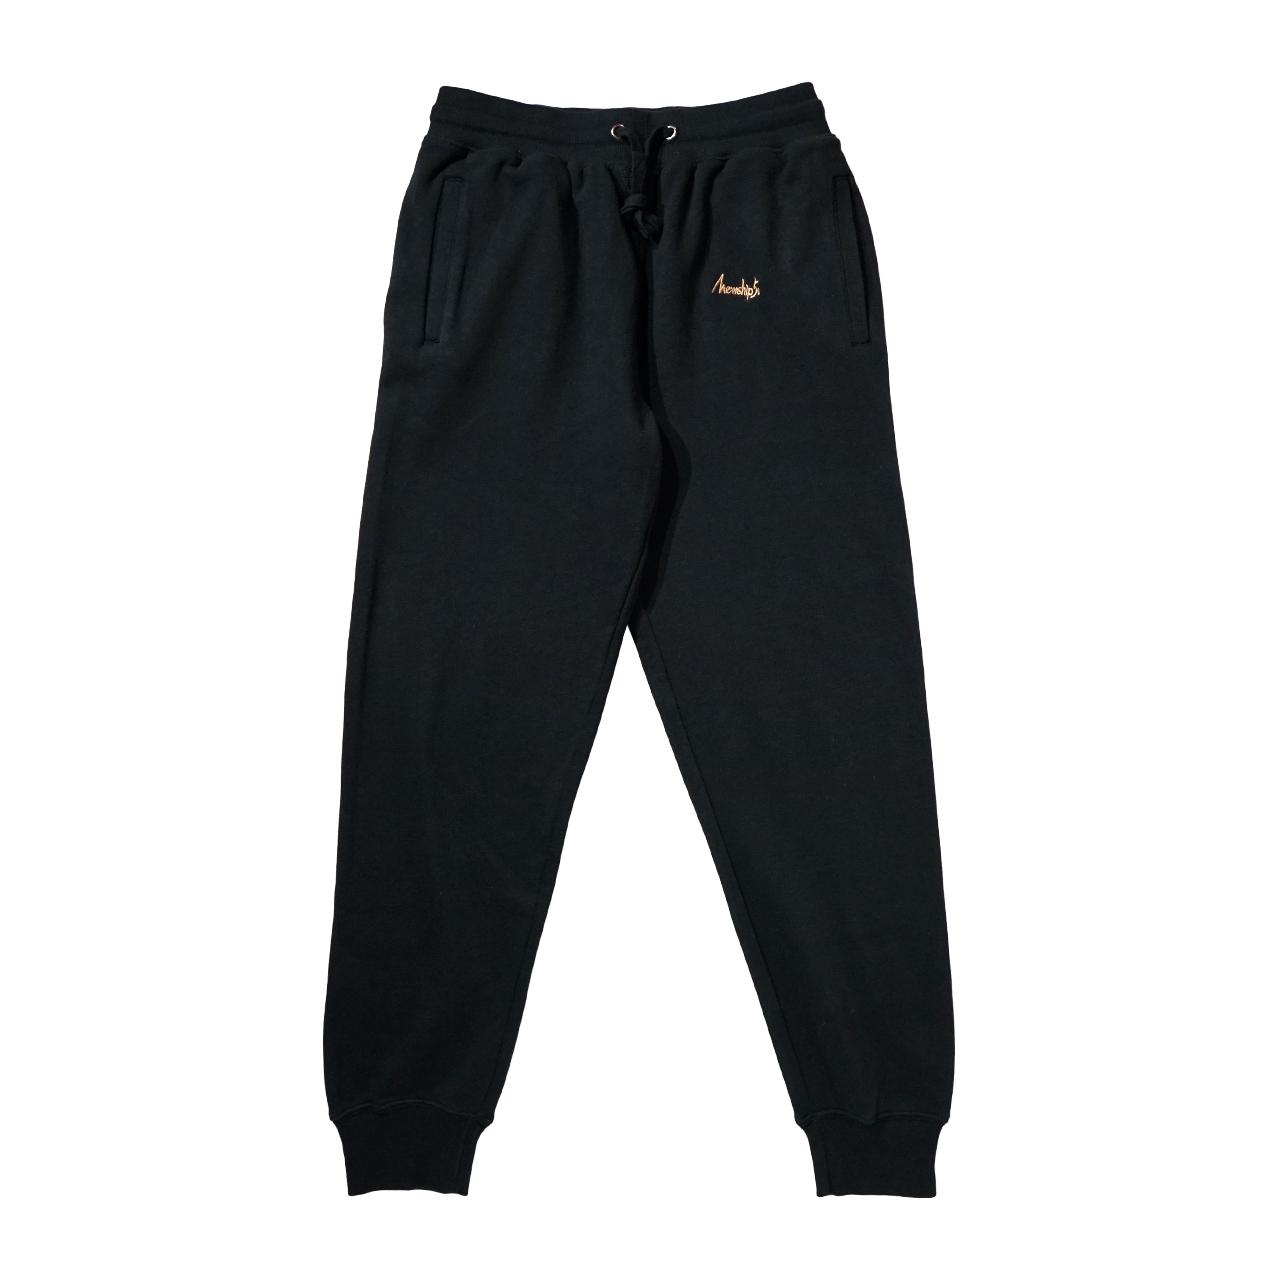 BASIC LOGO 019 light sweat pants <Black×Beige> - 画像1